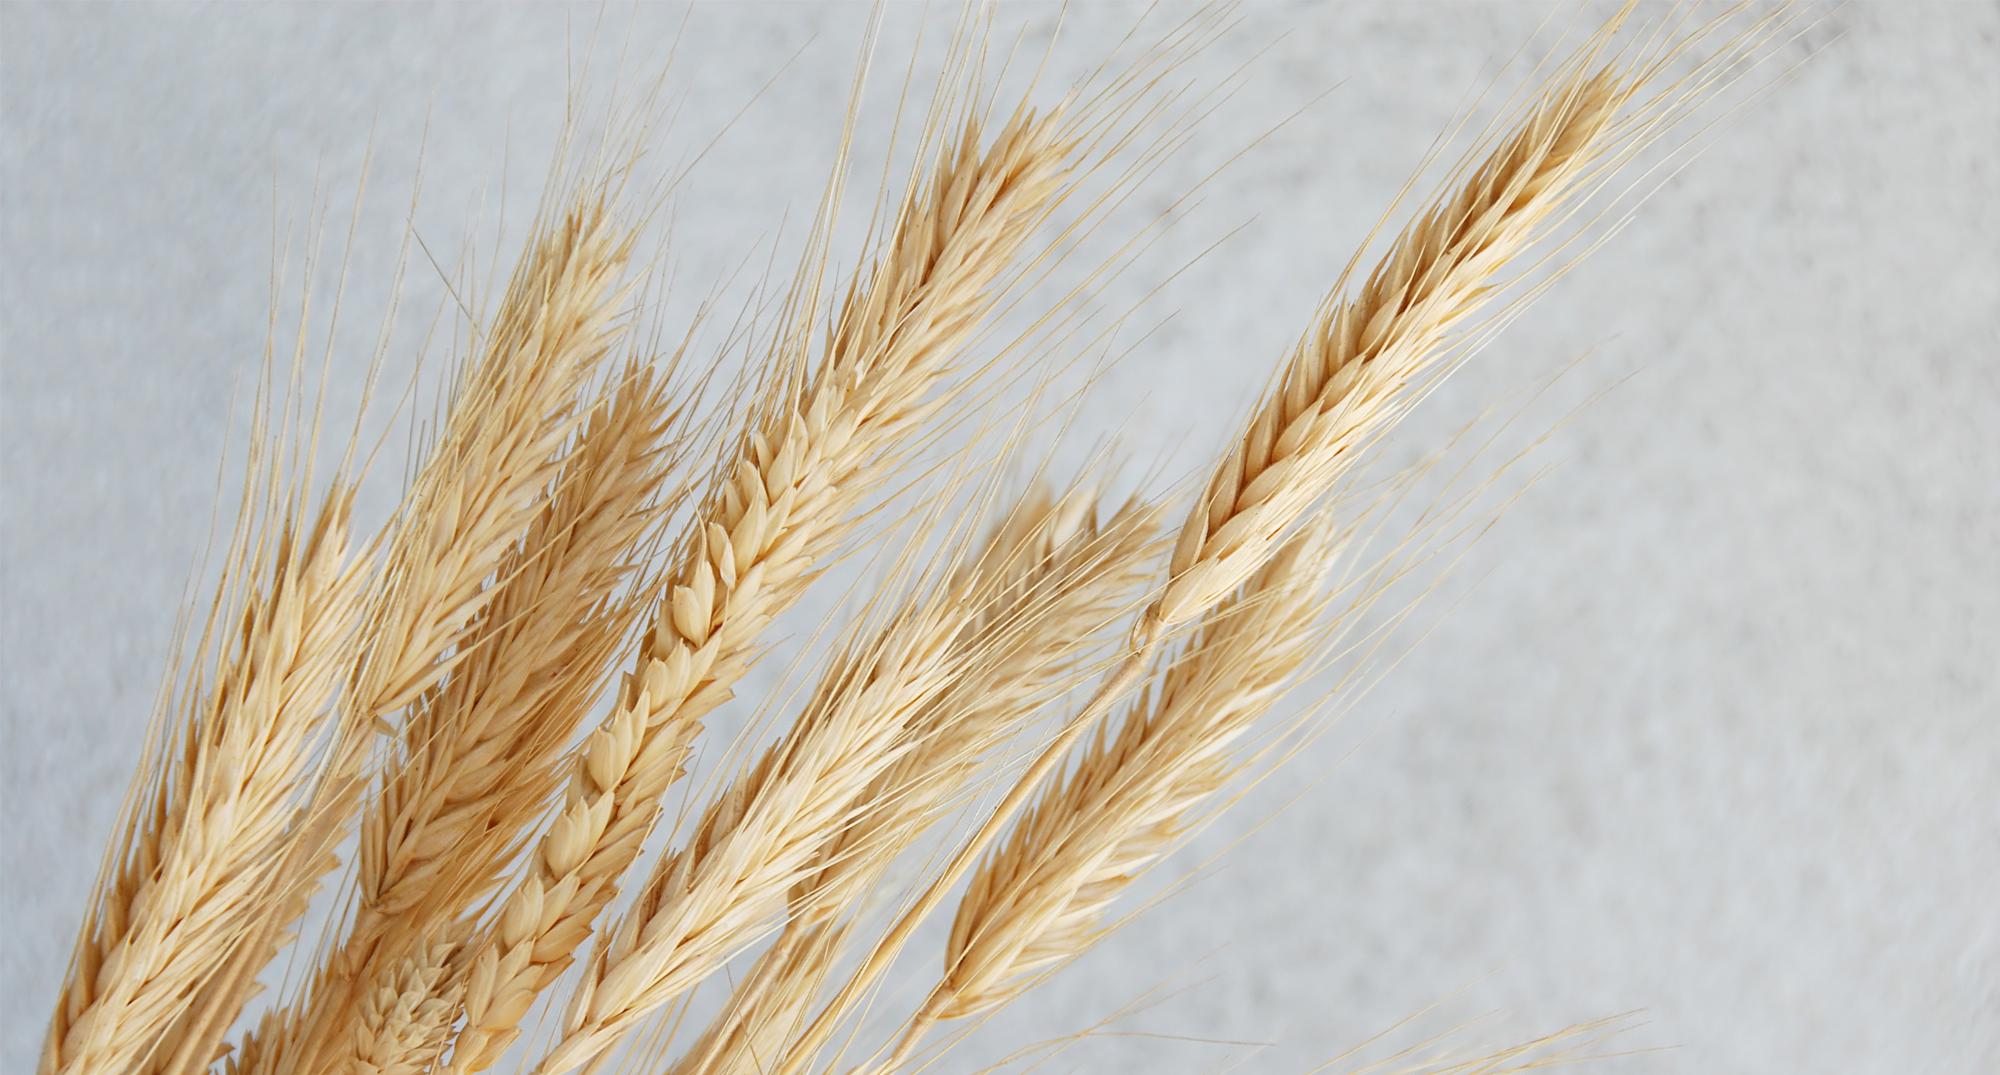 NUTRITION: Do I Need To Eat Gluten Free?